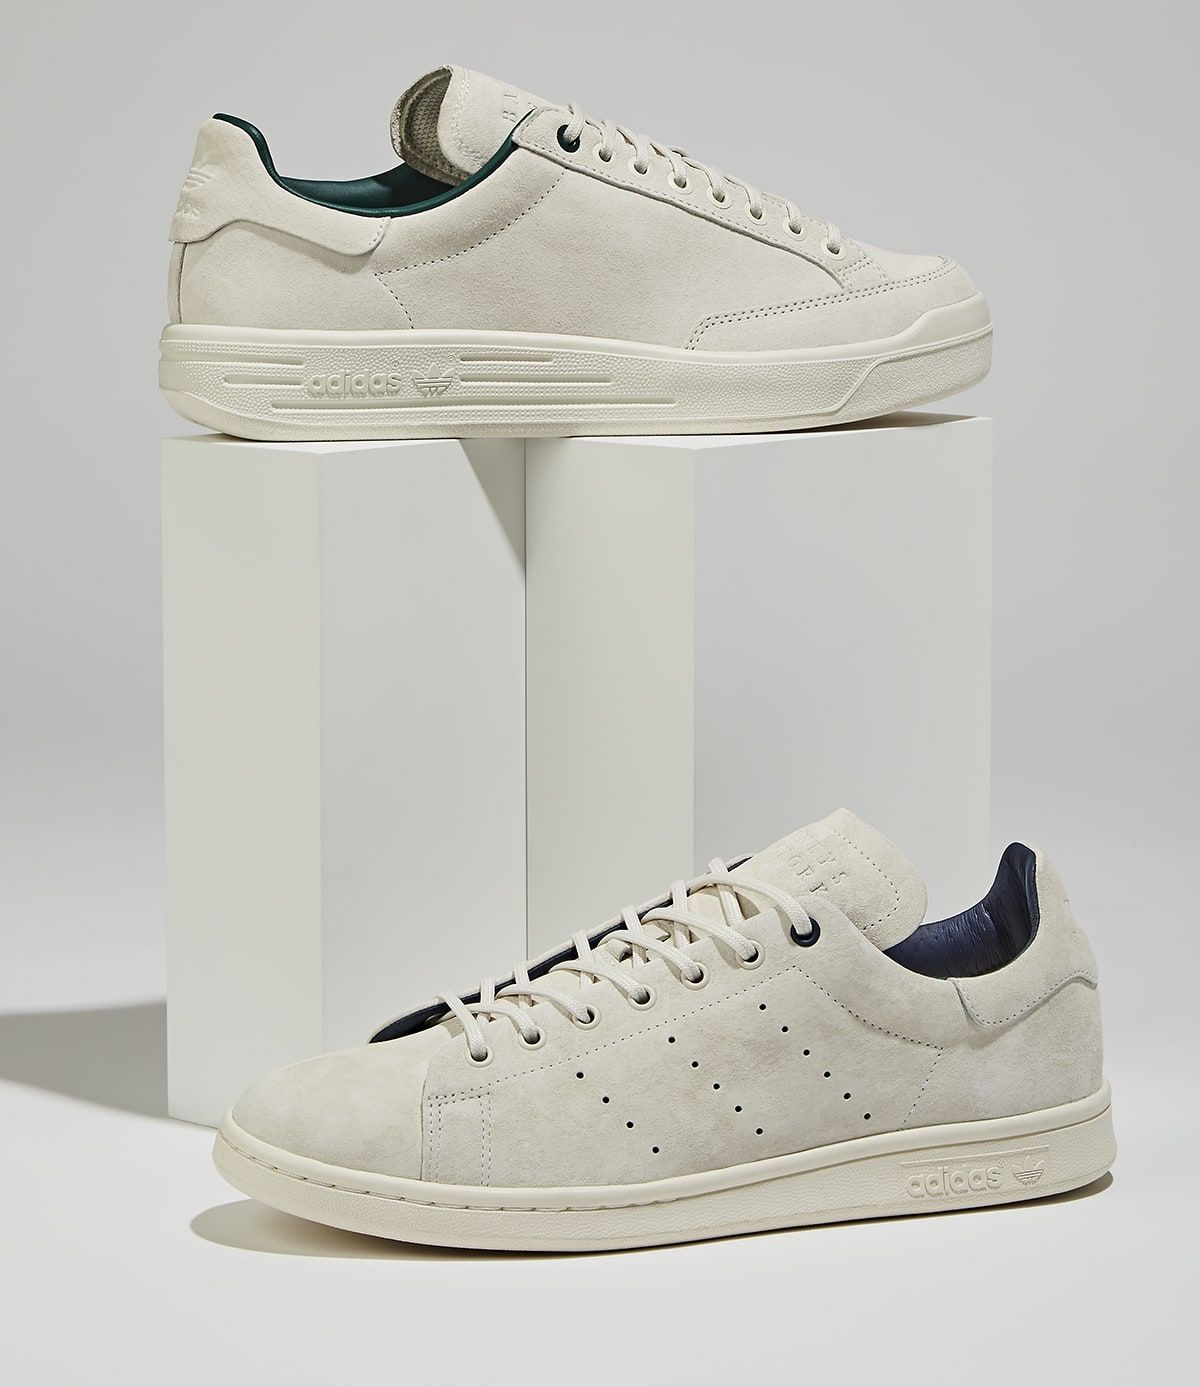 Barneys New York BNY Sole Series 2018 Adidas 2 | White